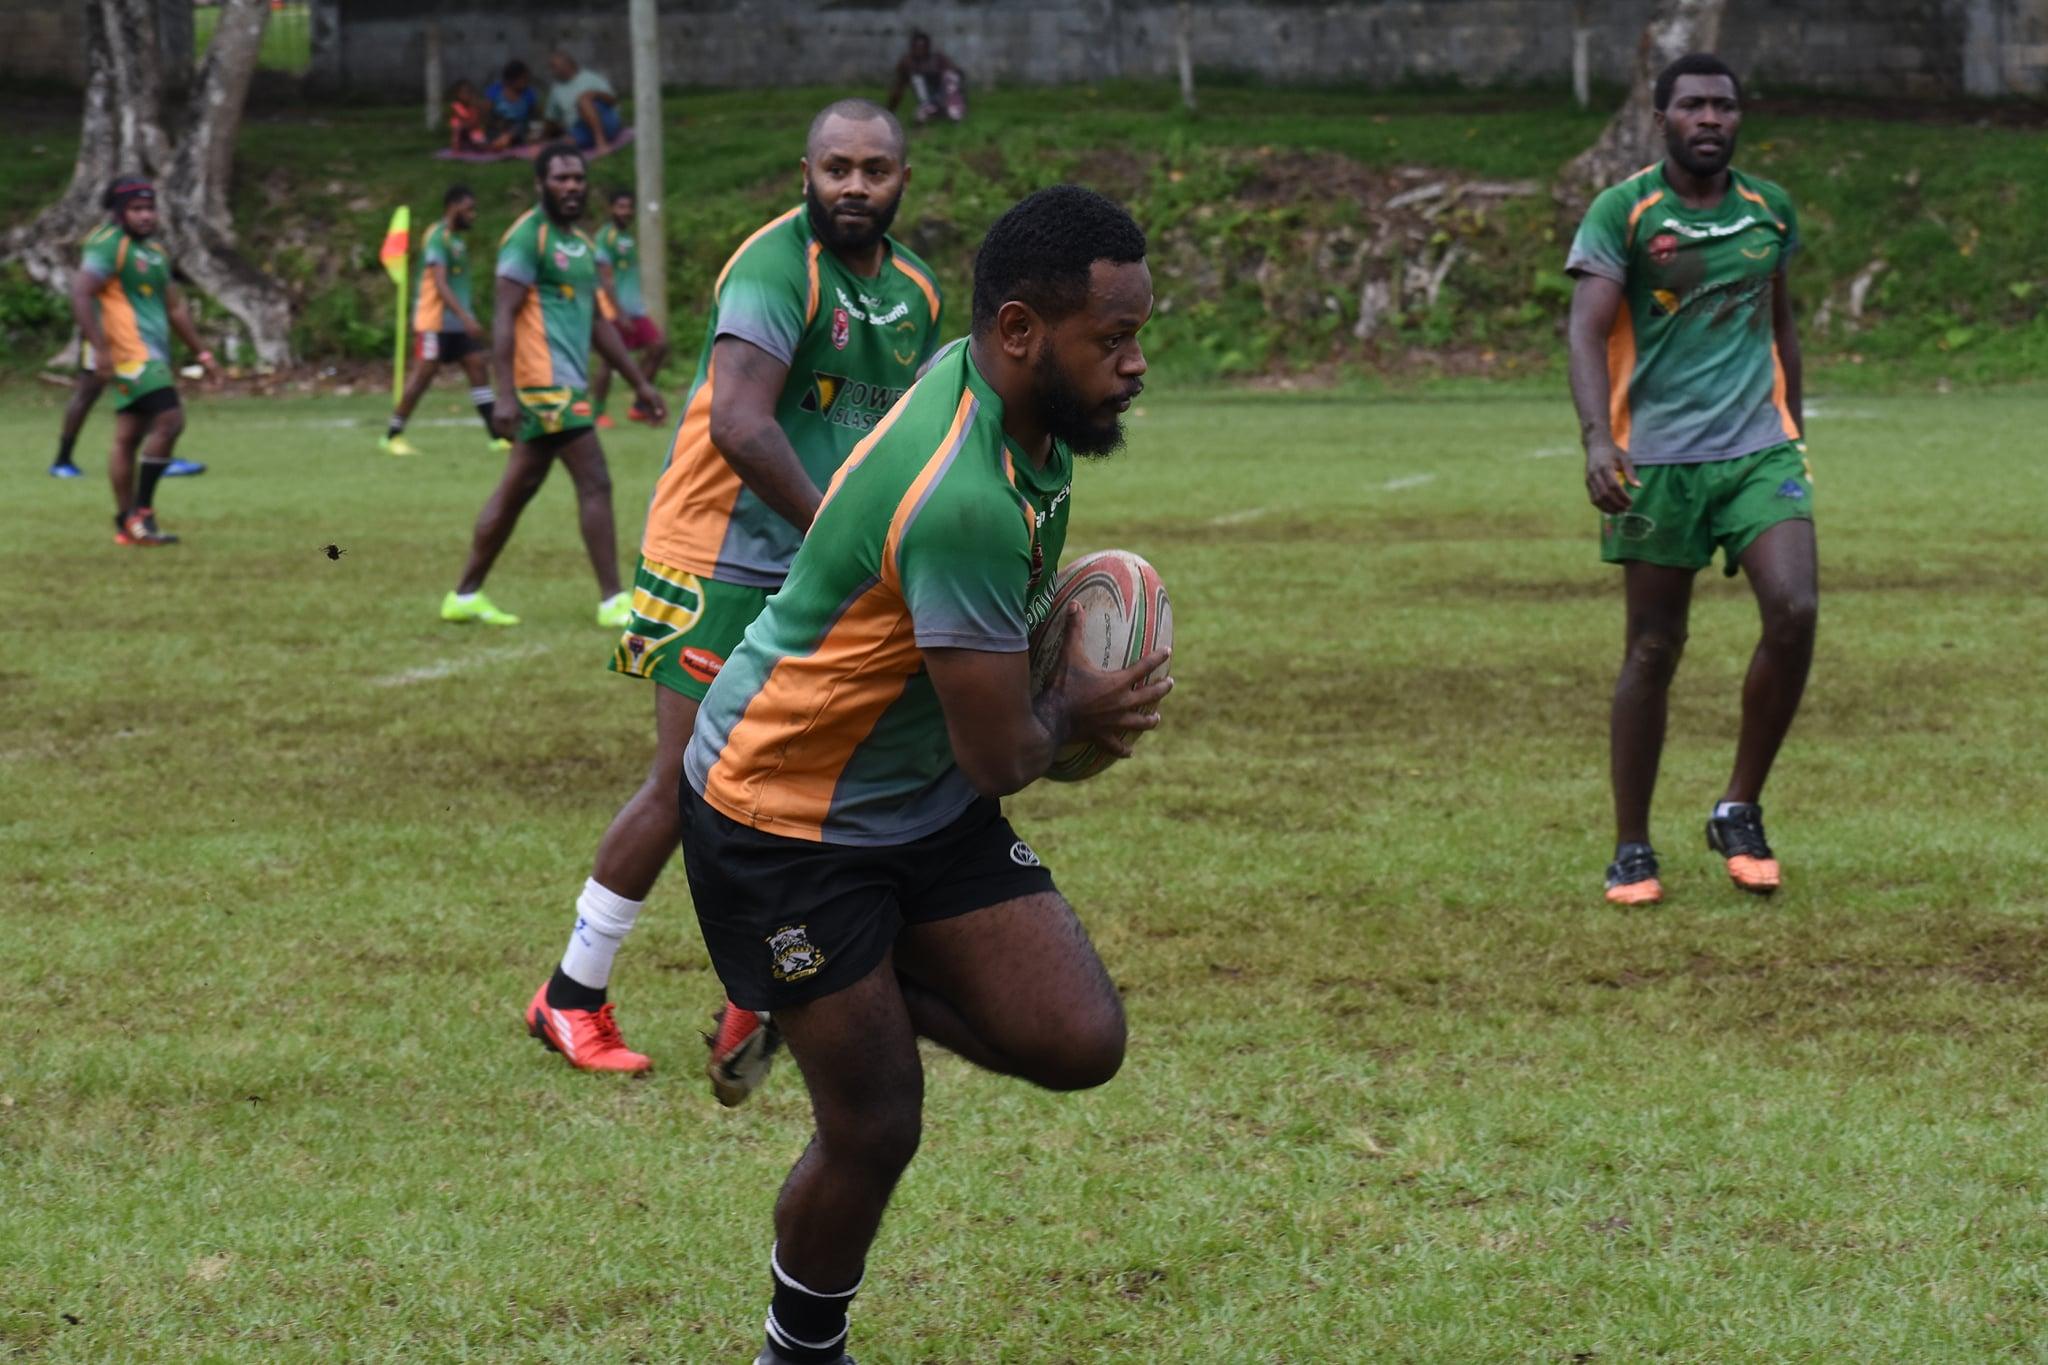 Vate continues strong start to Port Vila Men's season, Mele wins Women's Grand Final rematch